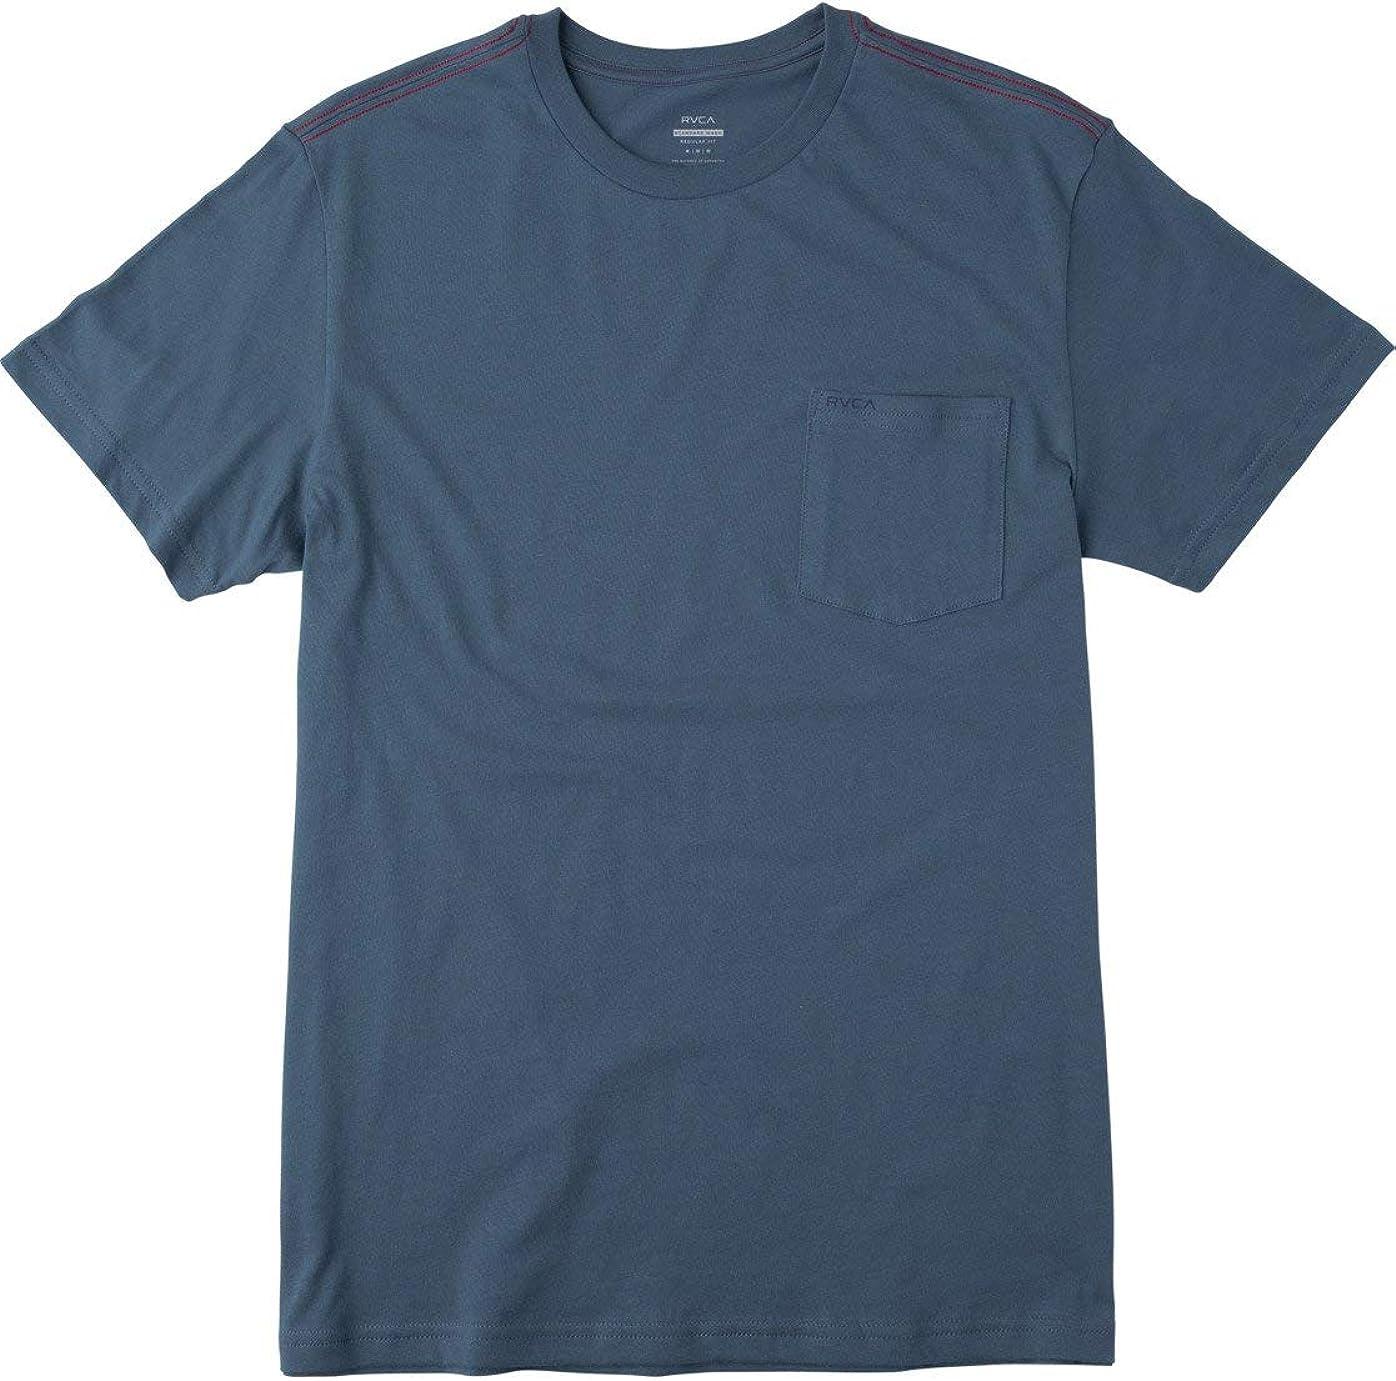 RVCA Men's PTC Standard Wash Short Sleeve Crew Neck Pocket T-Shirt: Clothing